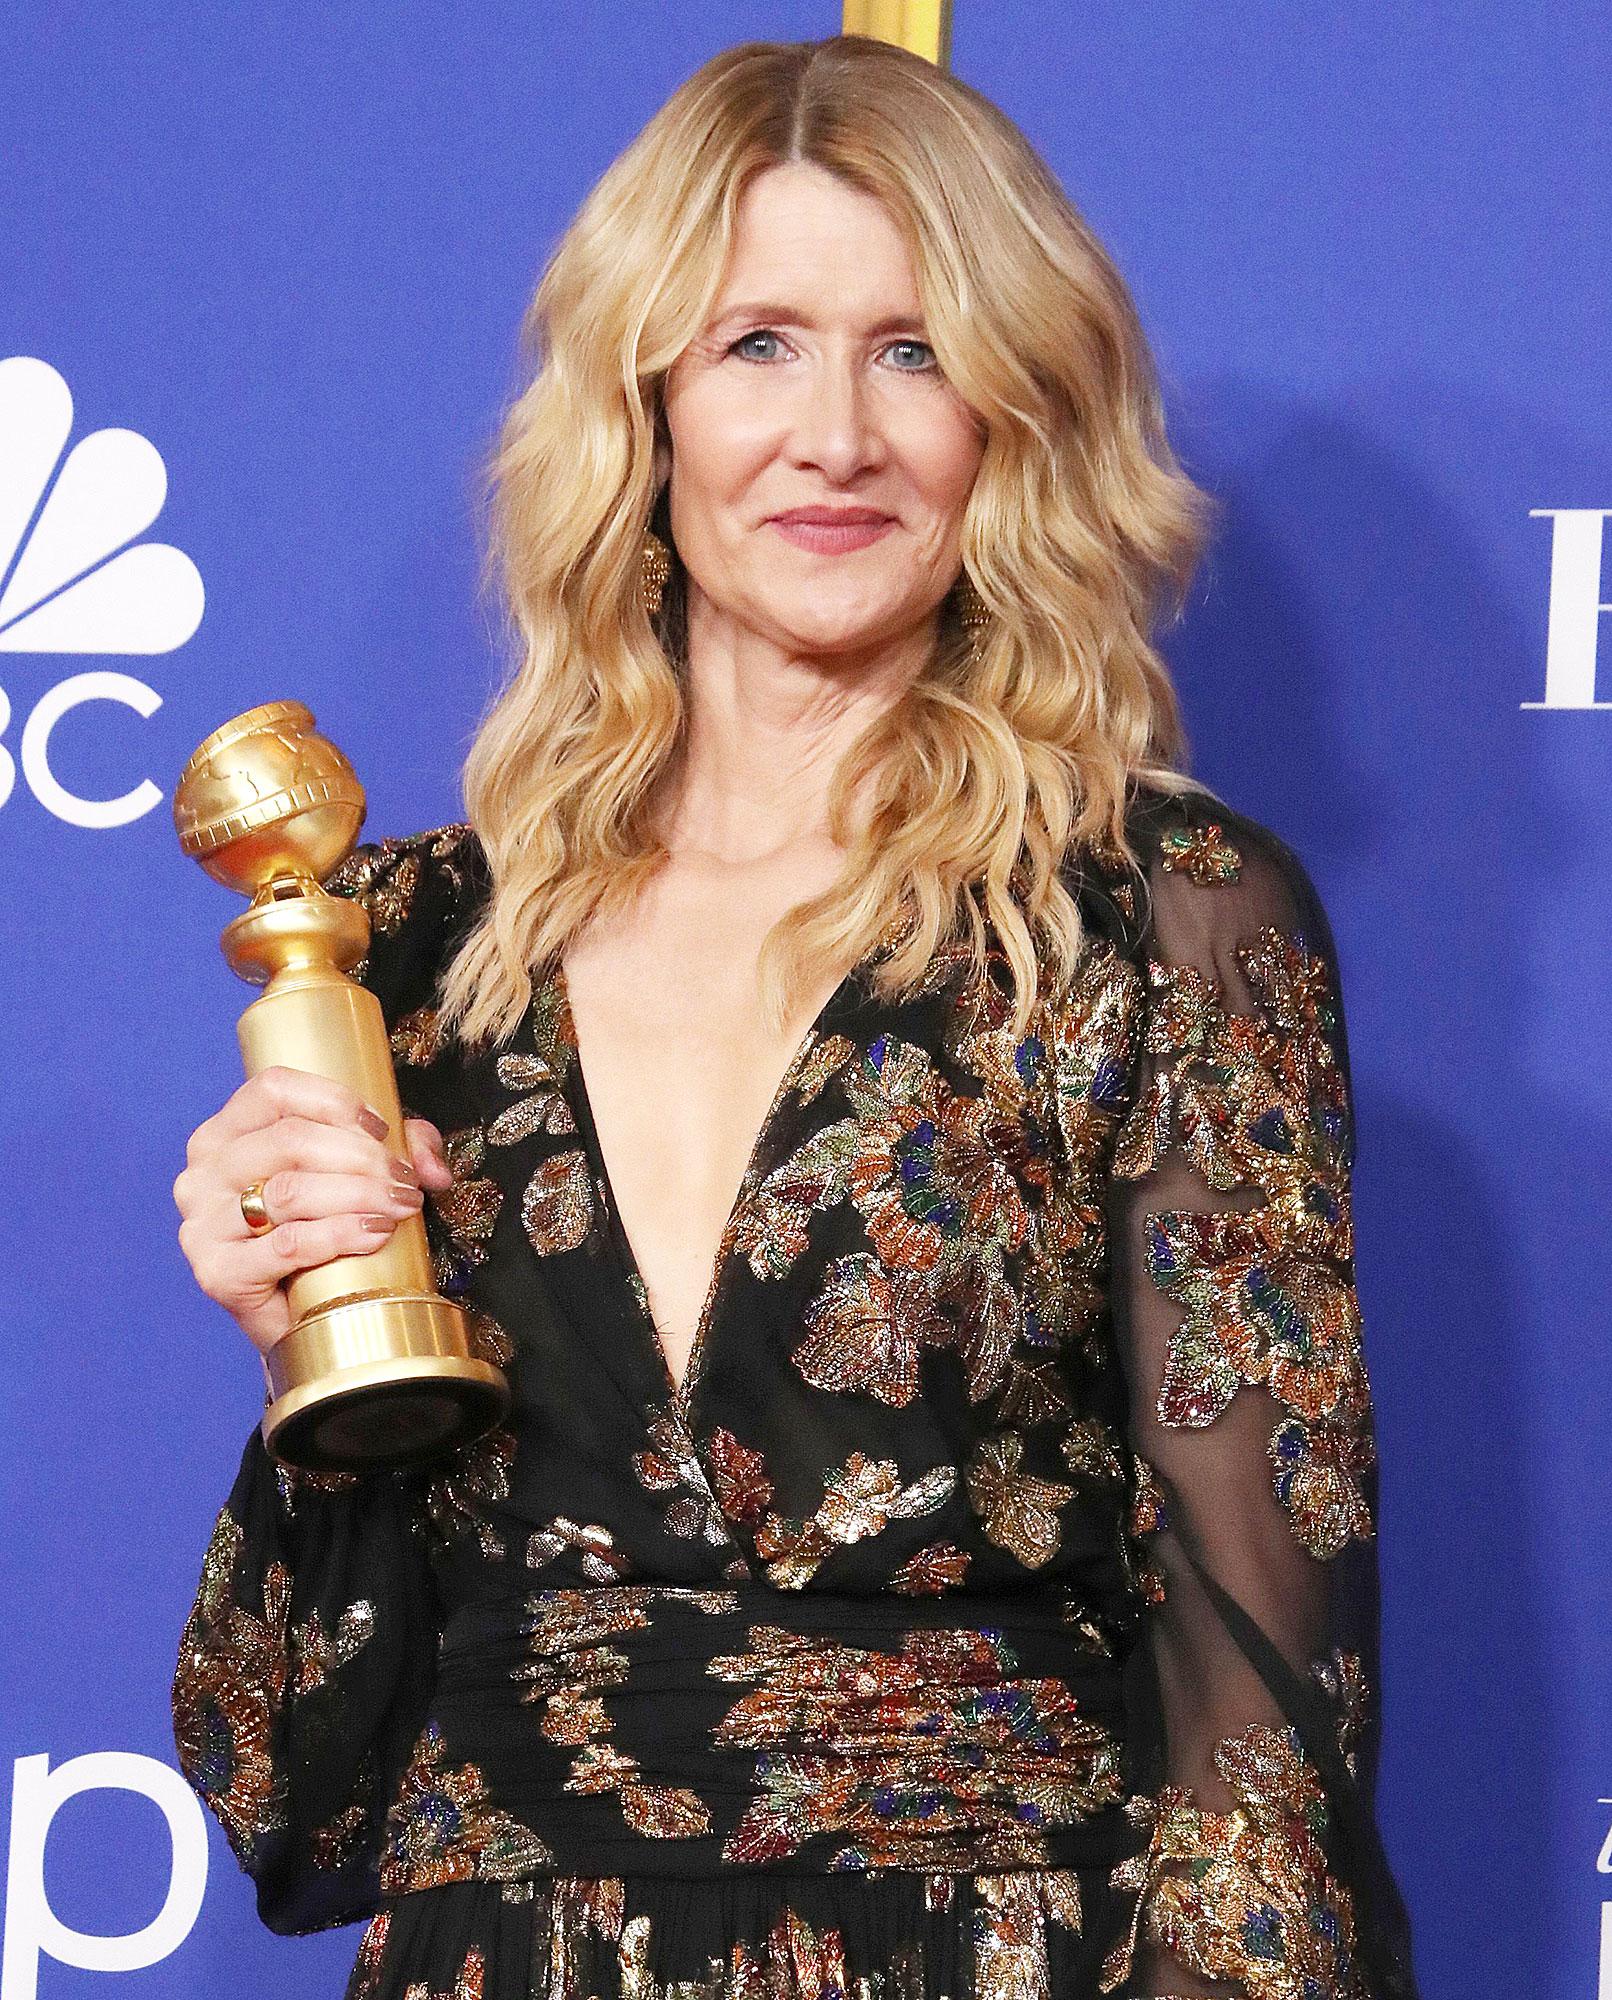 Laura Dern with her Golden Globe Award reveals why she cried during Ellen Degeneres Golden Globes acceptance speech